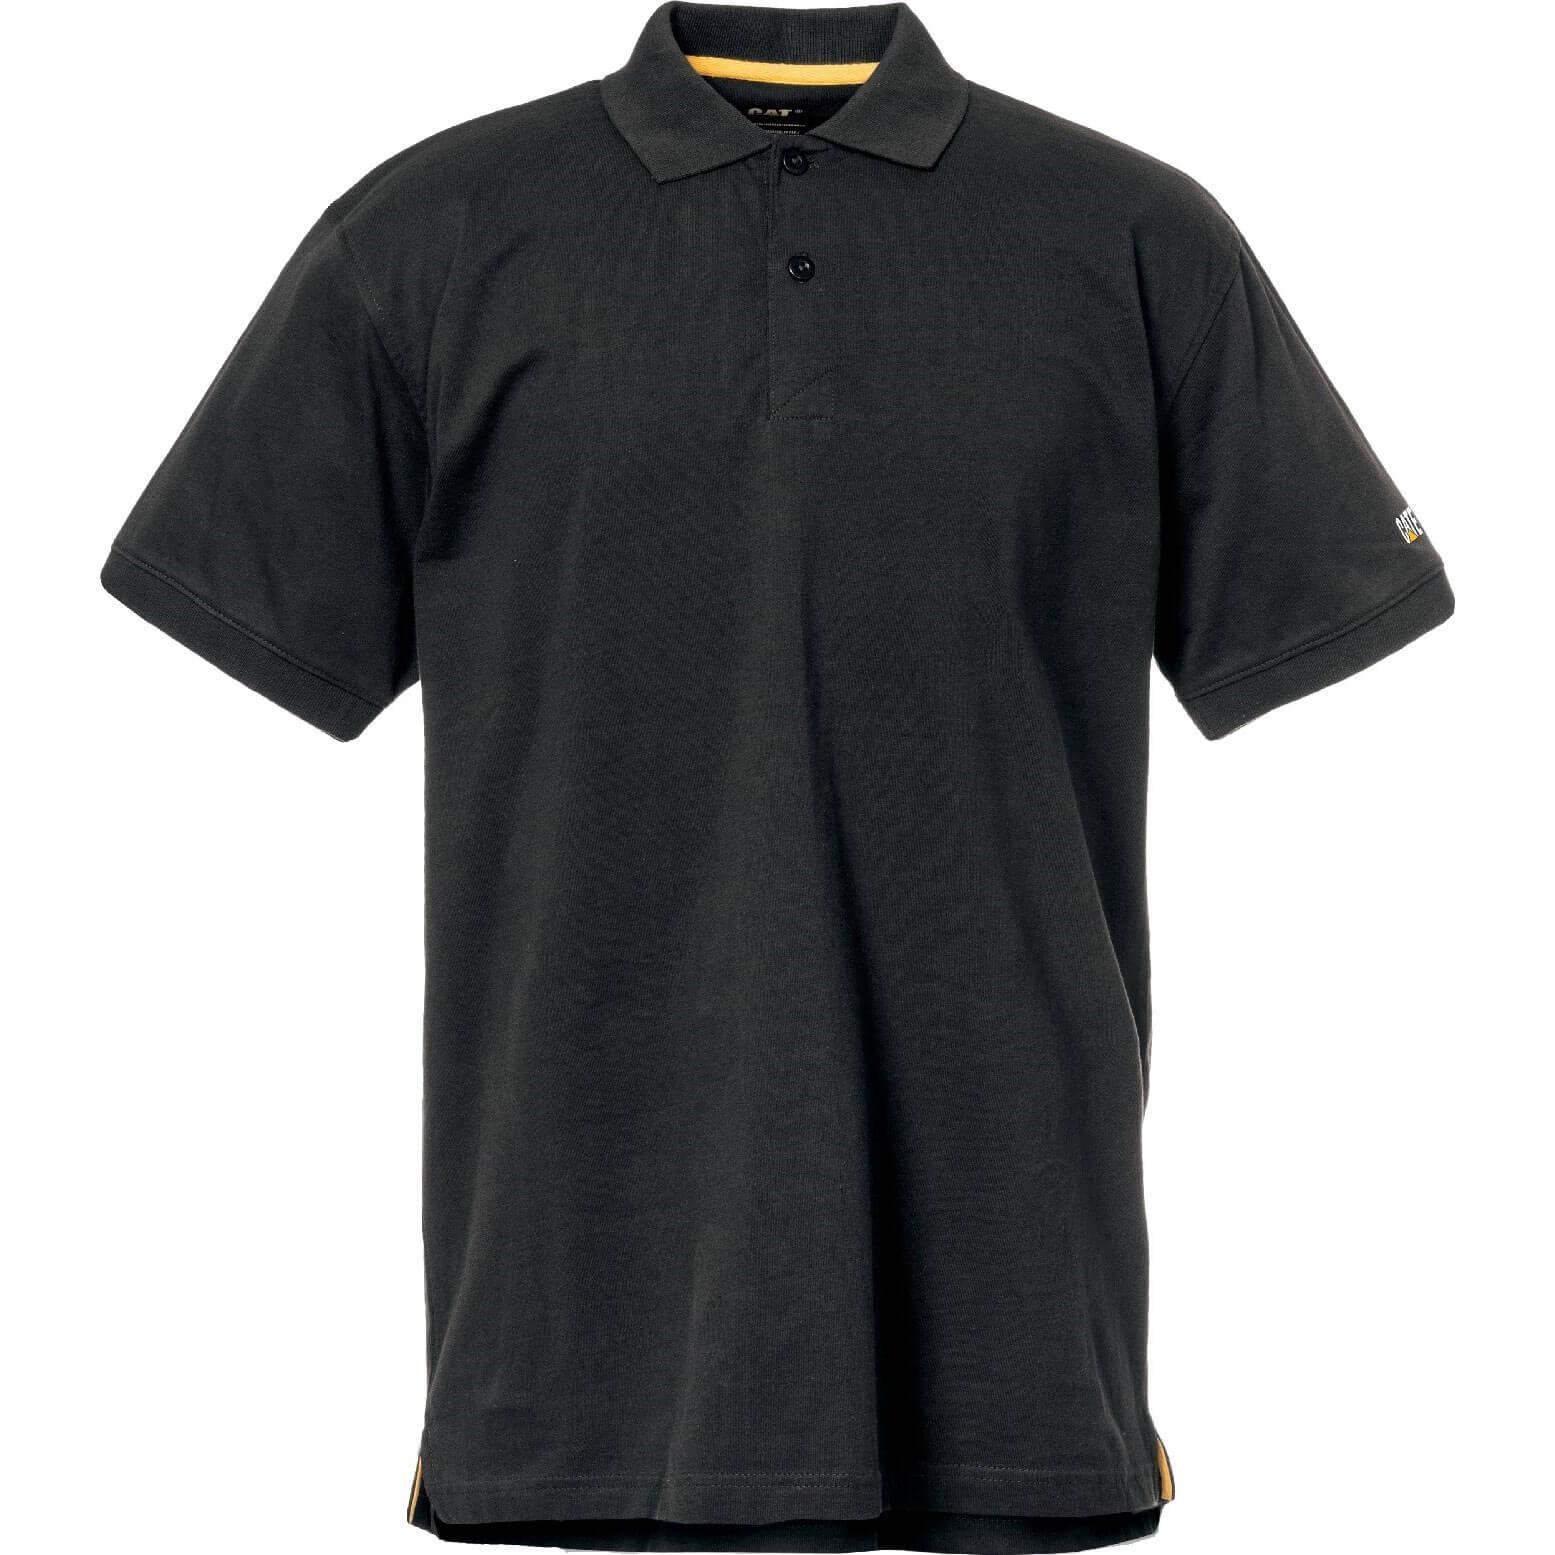 CHEAP Caterpillar Mens Classic Polo Shirt Black S – Men's Clothing